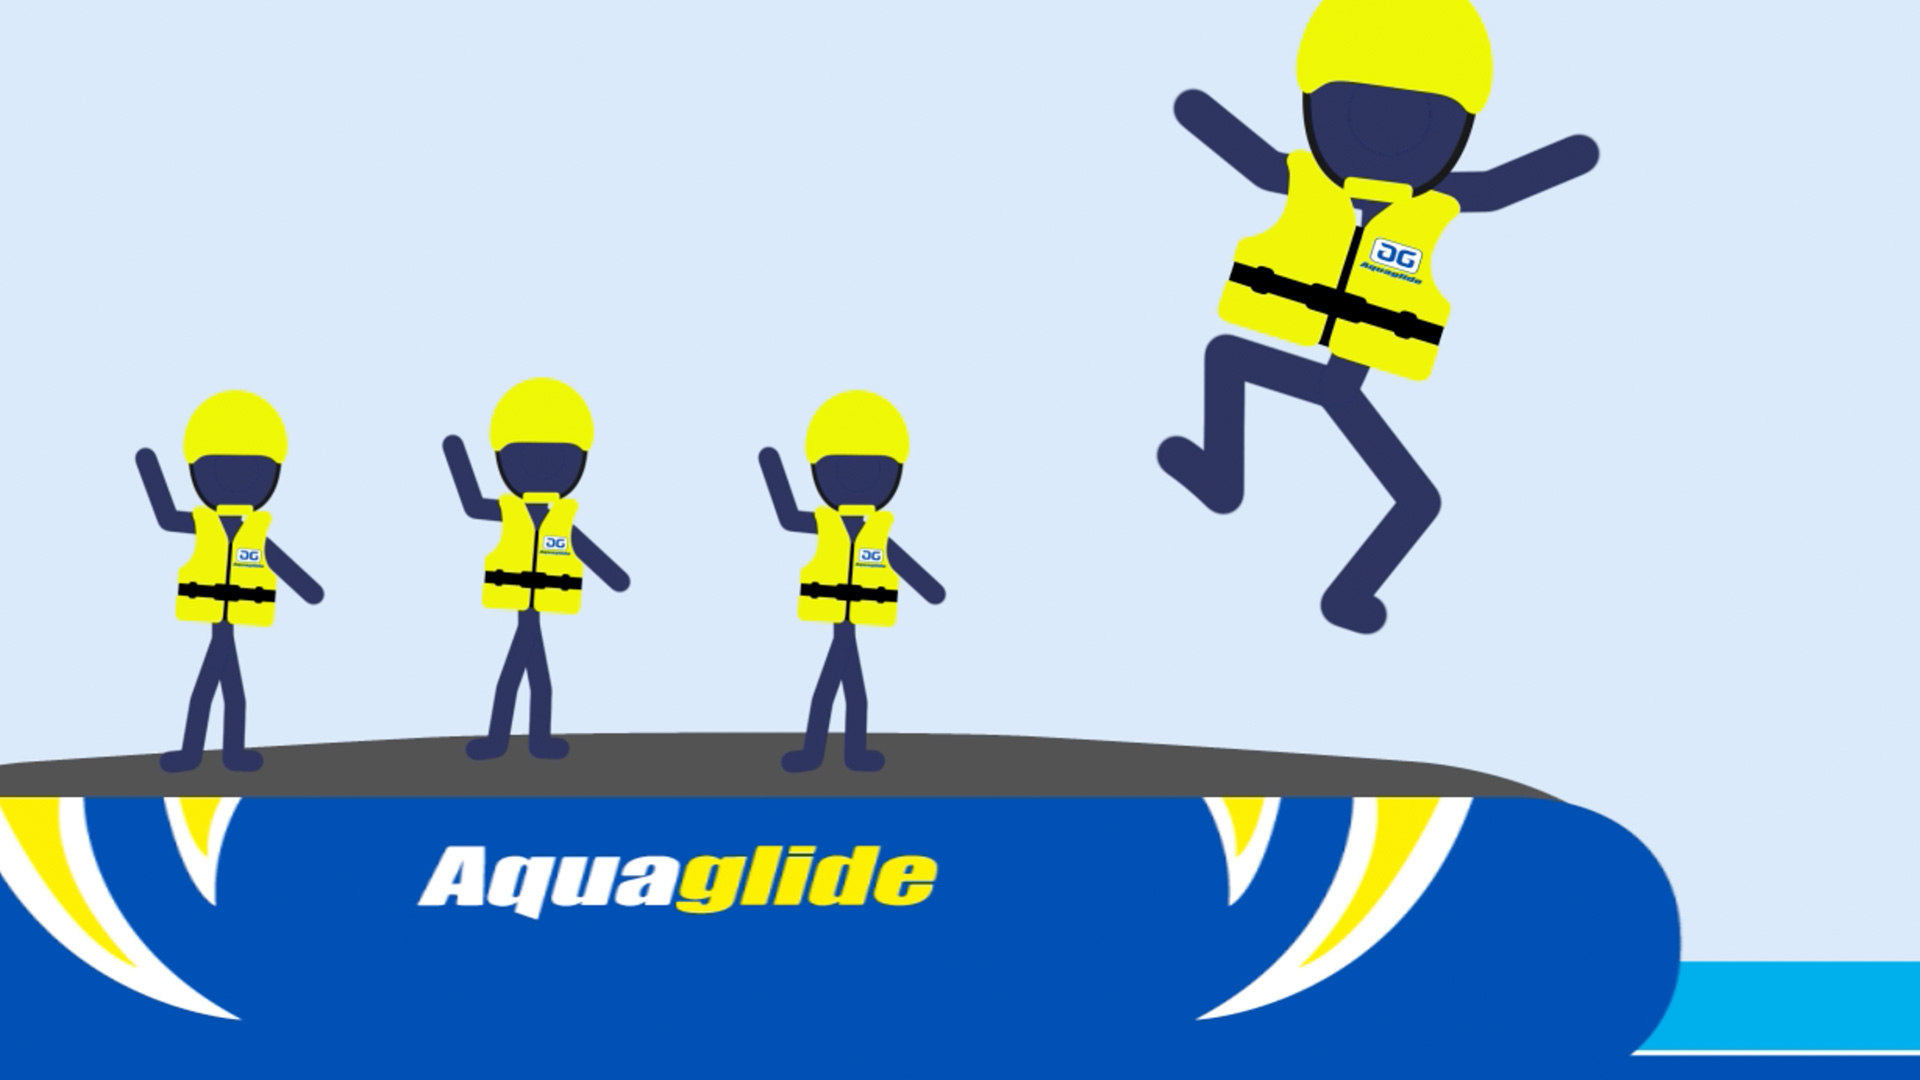 Aquaglide - ANIMATION • ILLUSTRATION